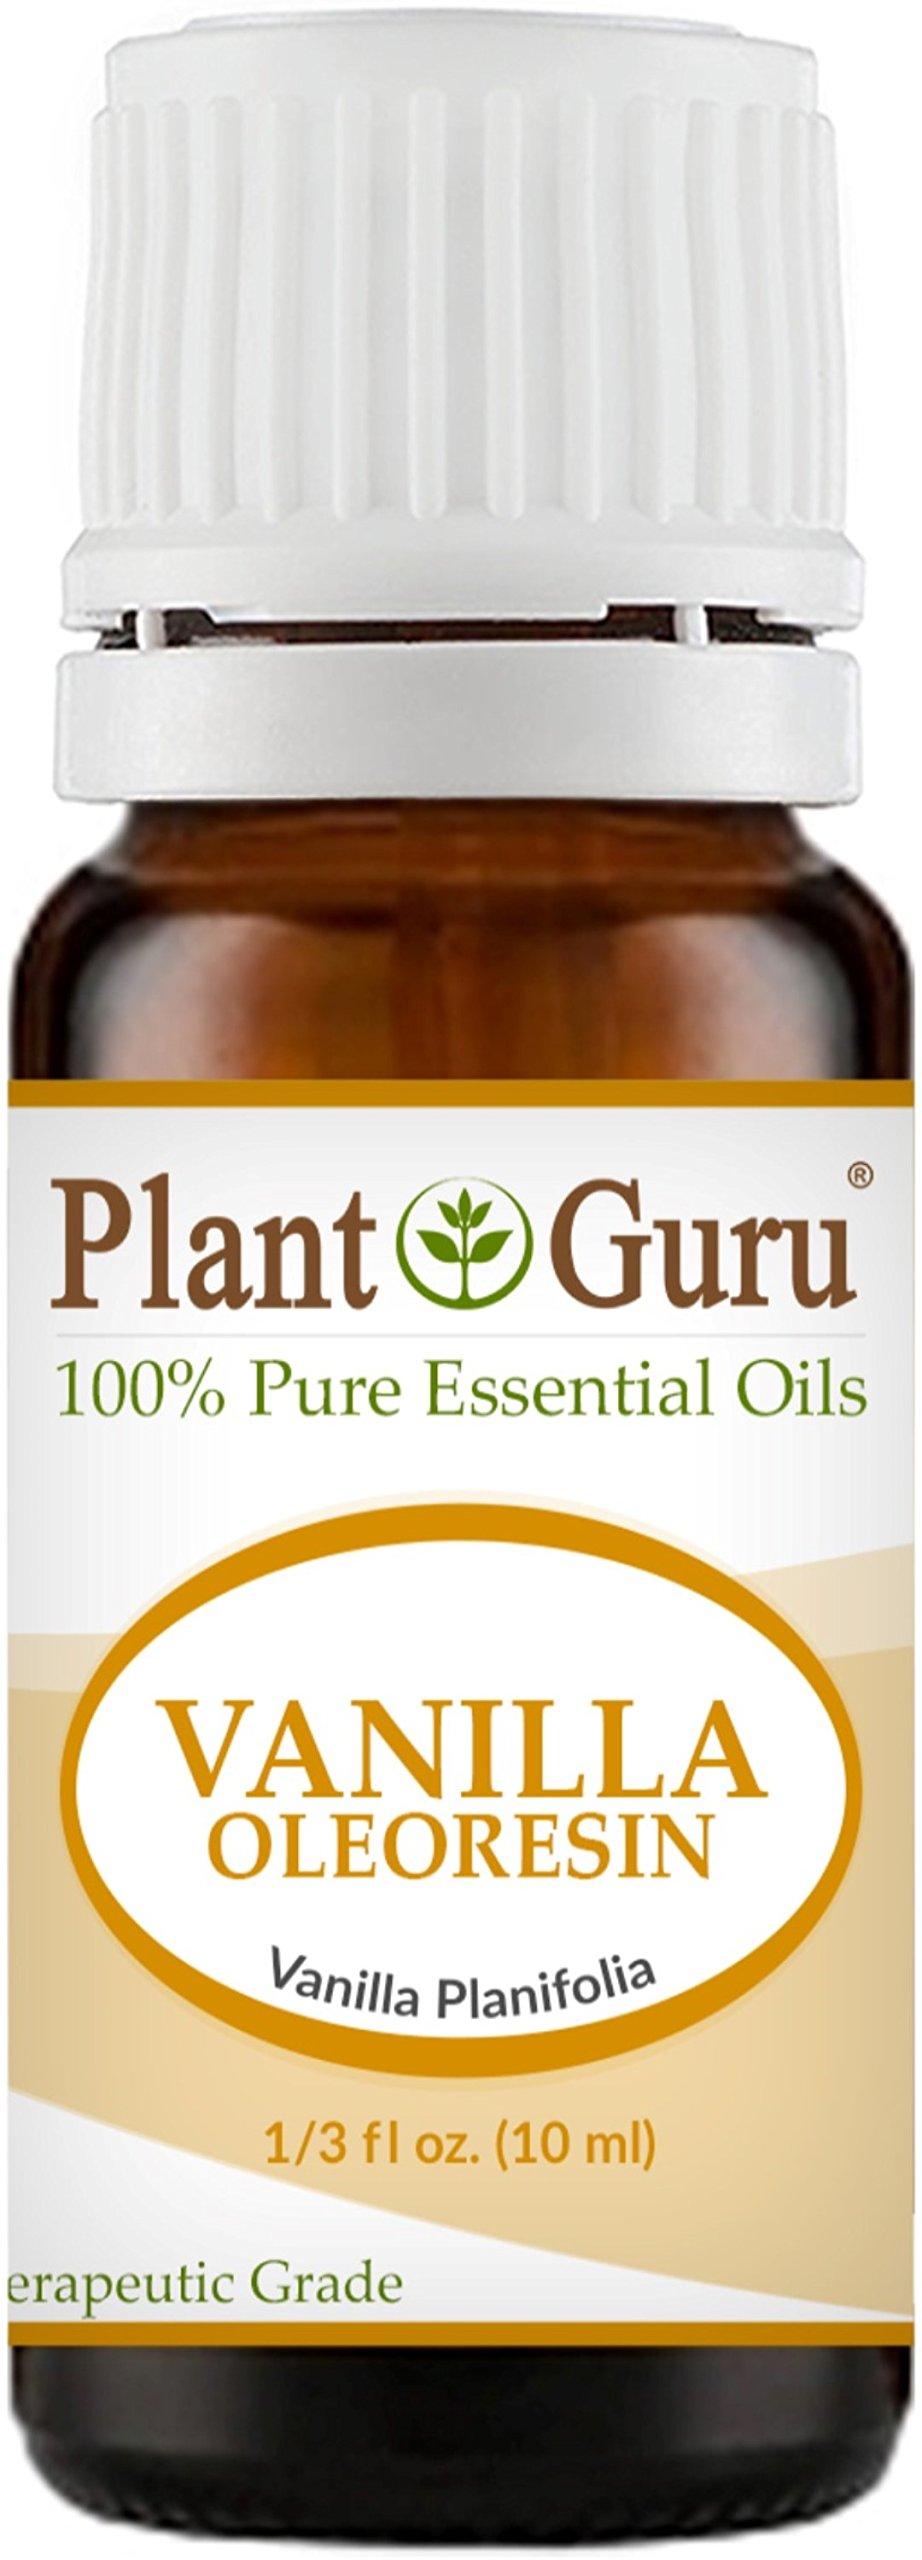 Vanilla Oleoresin Essential Oil 10 ml. 100% Pure Undiluted Therapeutic Grade. 10 Fold Extraction